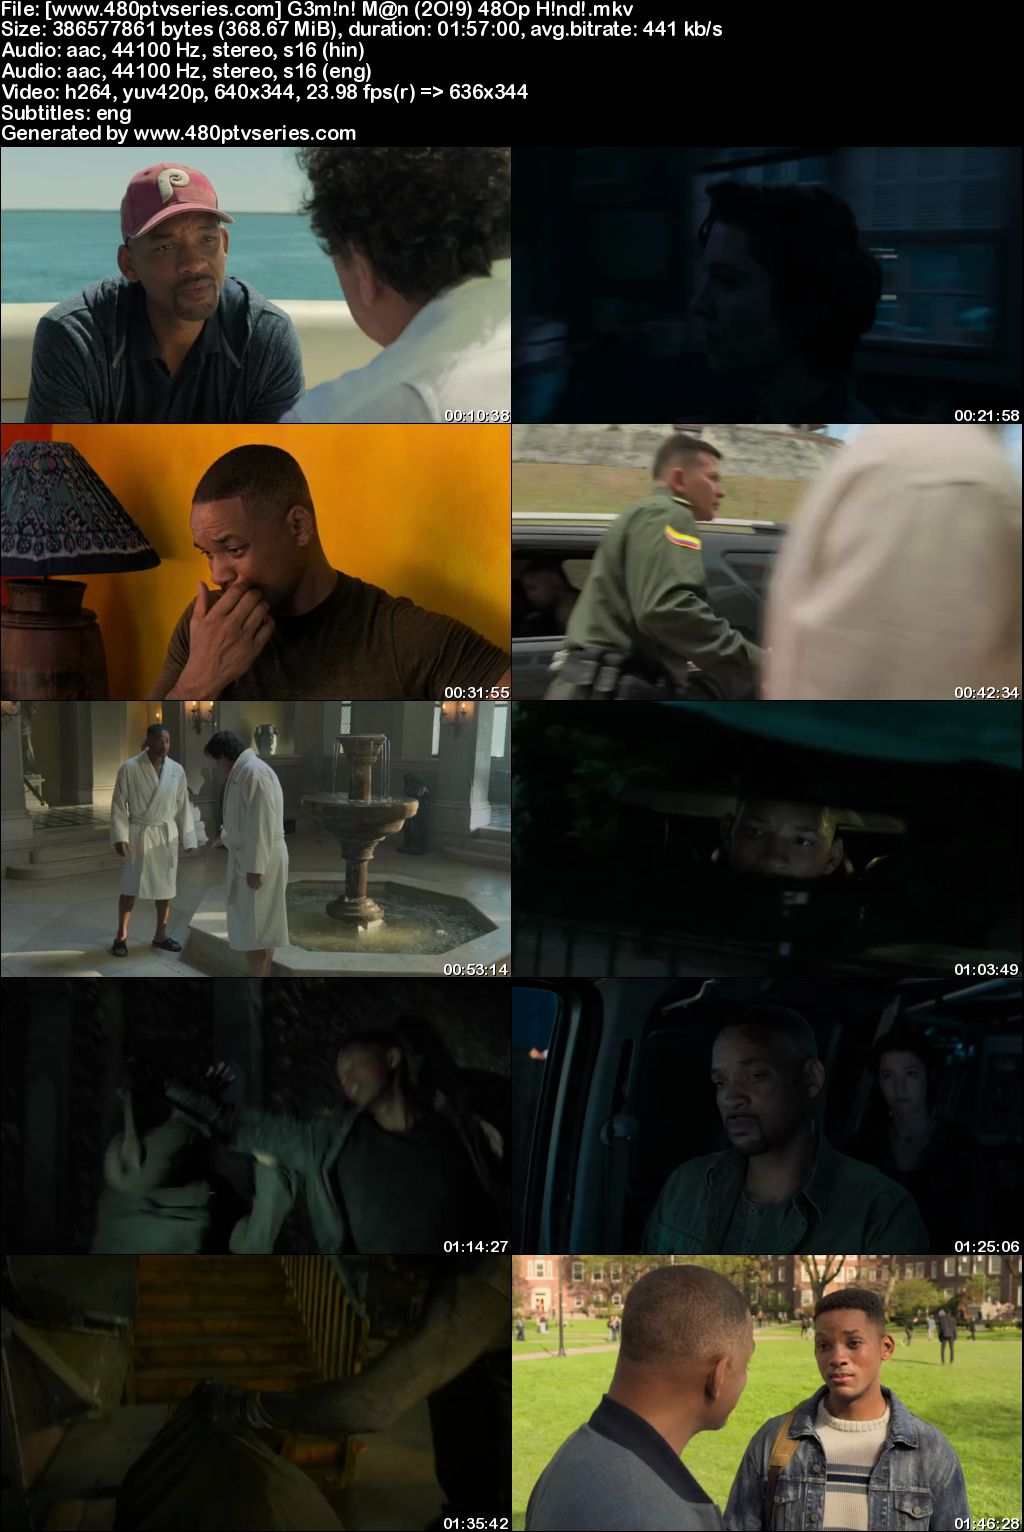 Gemini Man (2019) 350MB Full Hindi Dual Audio Movie Download 480p Bluray Free Watch Online Full Movie Download Worldfree4u 9xmovies